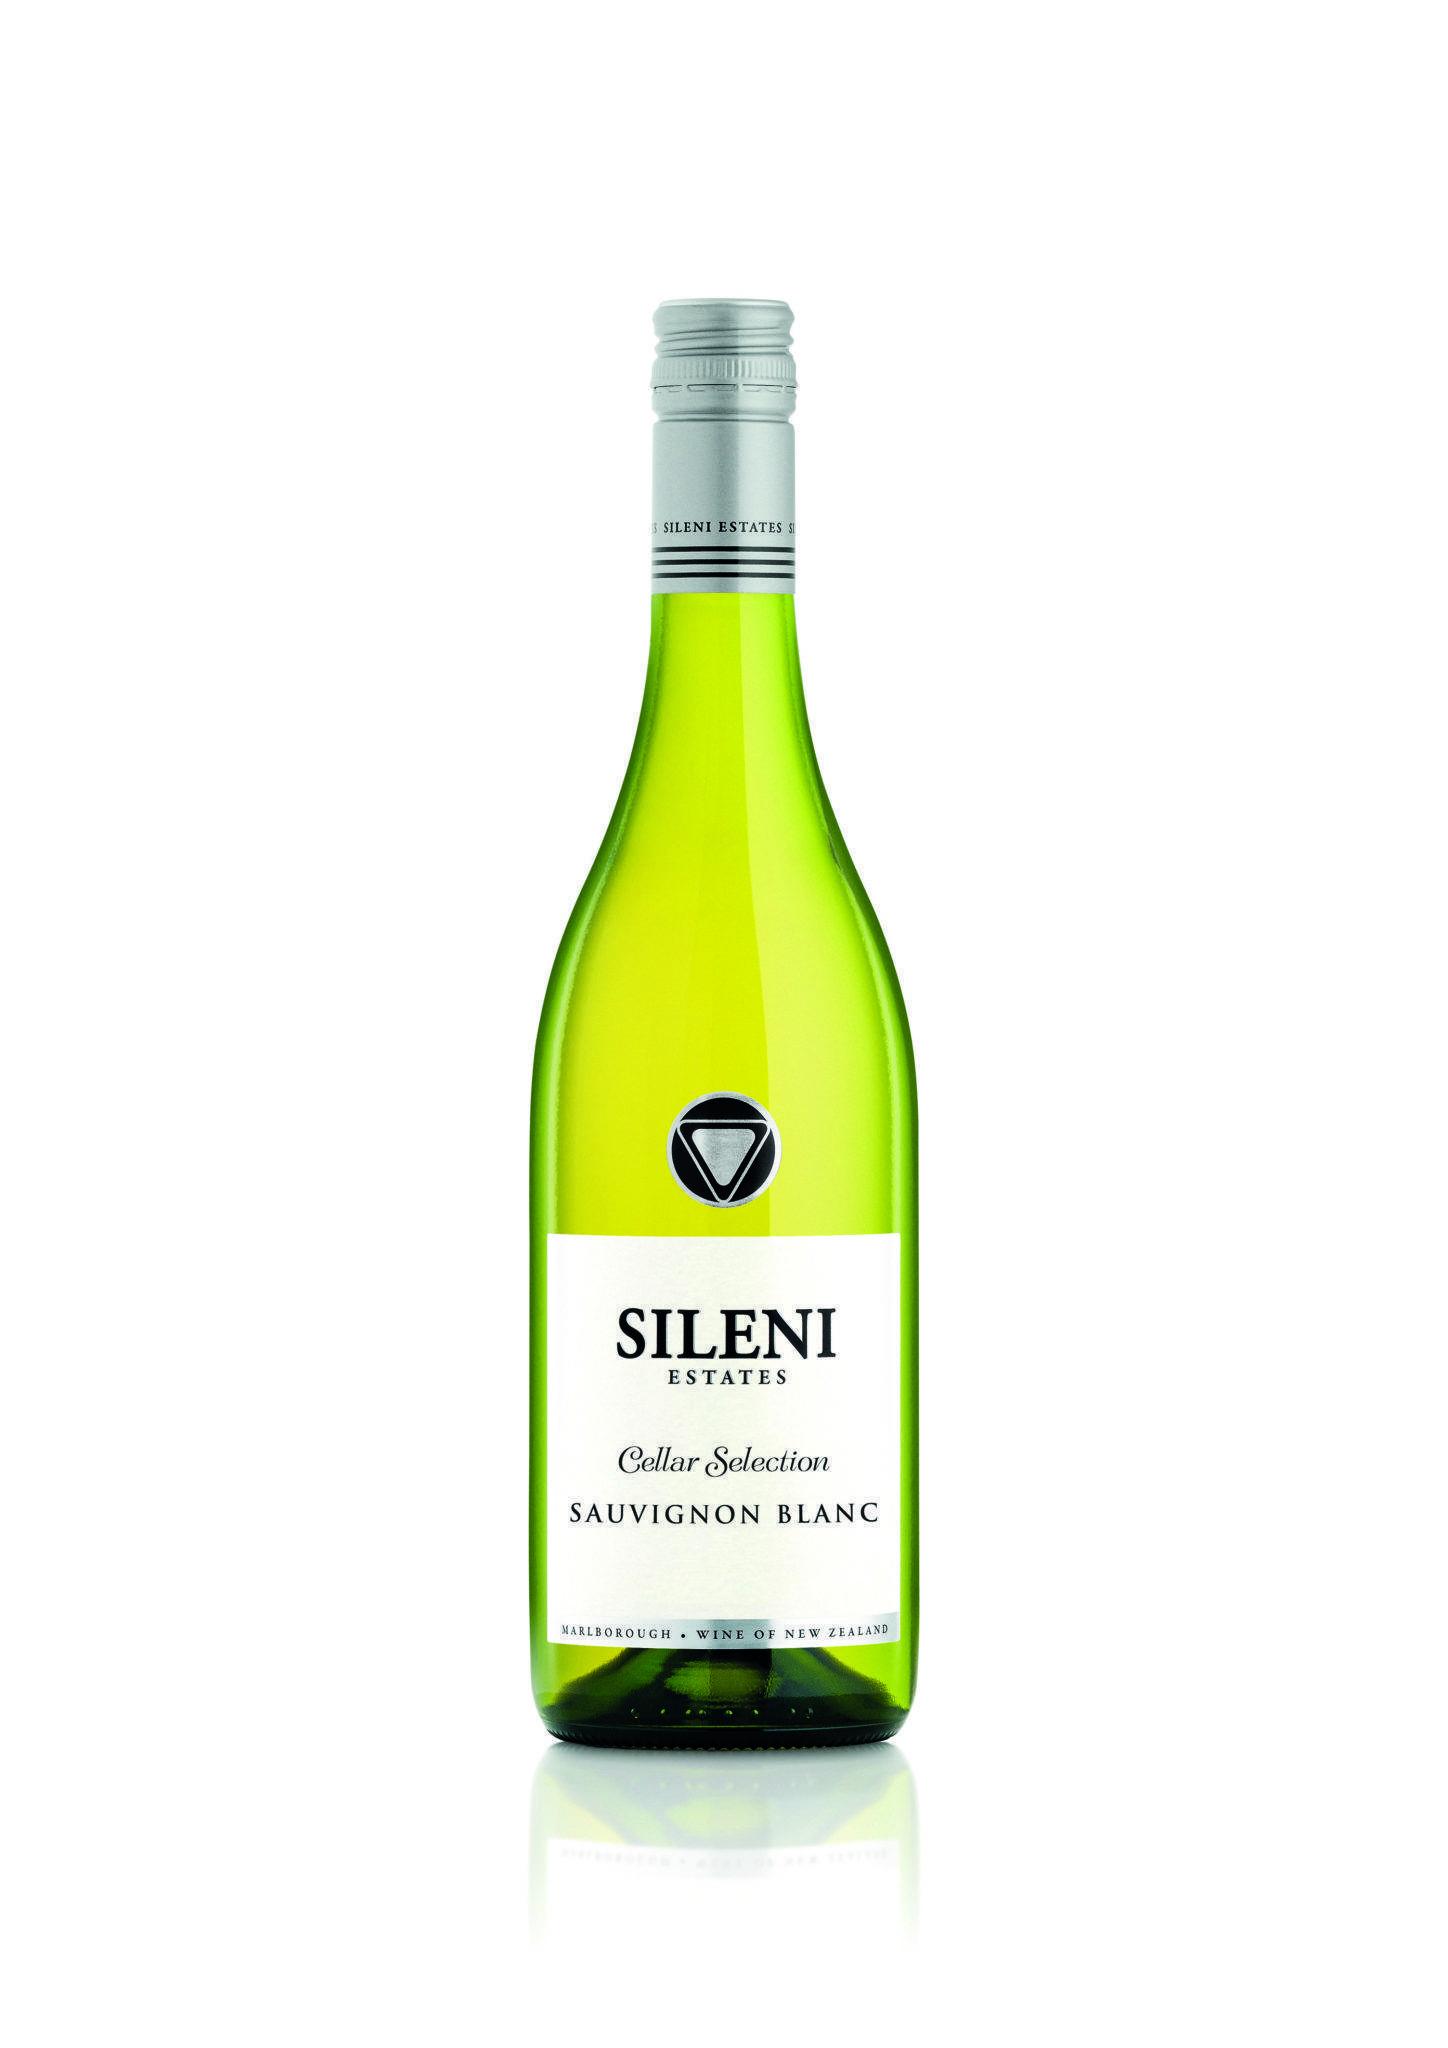 Совиньон блан: особенности сорта винограда и вина